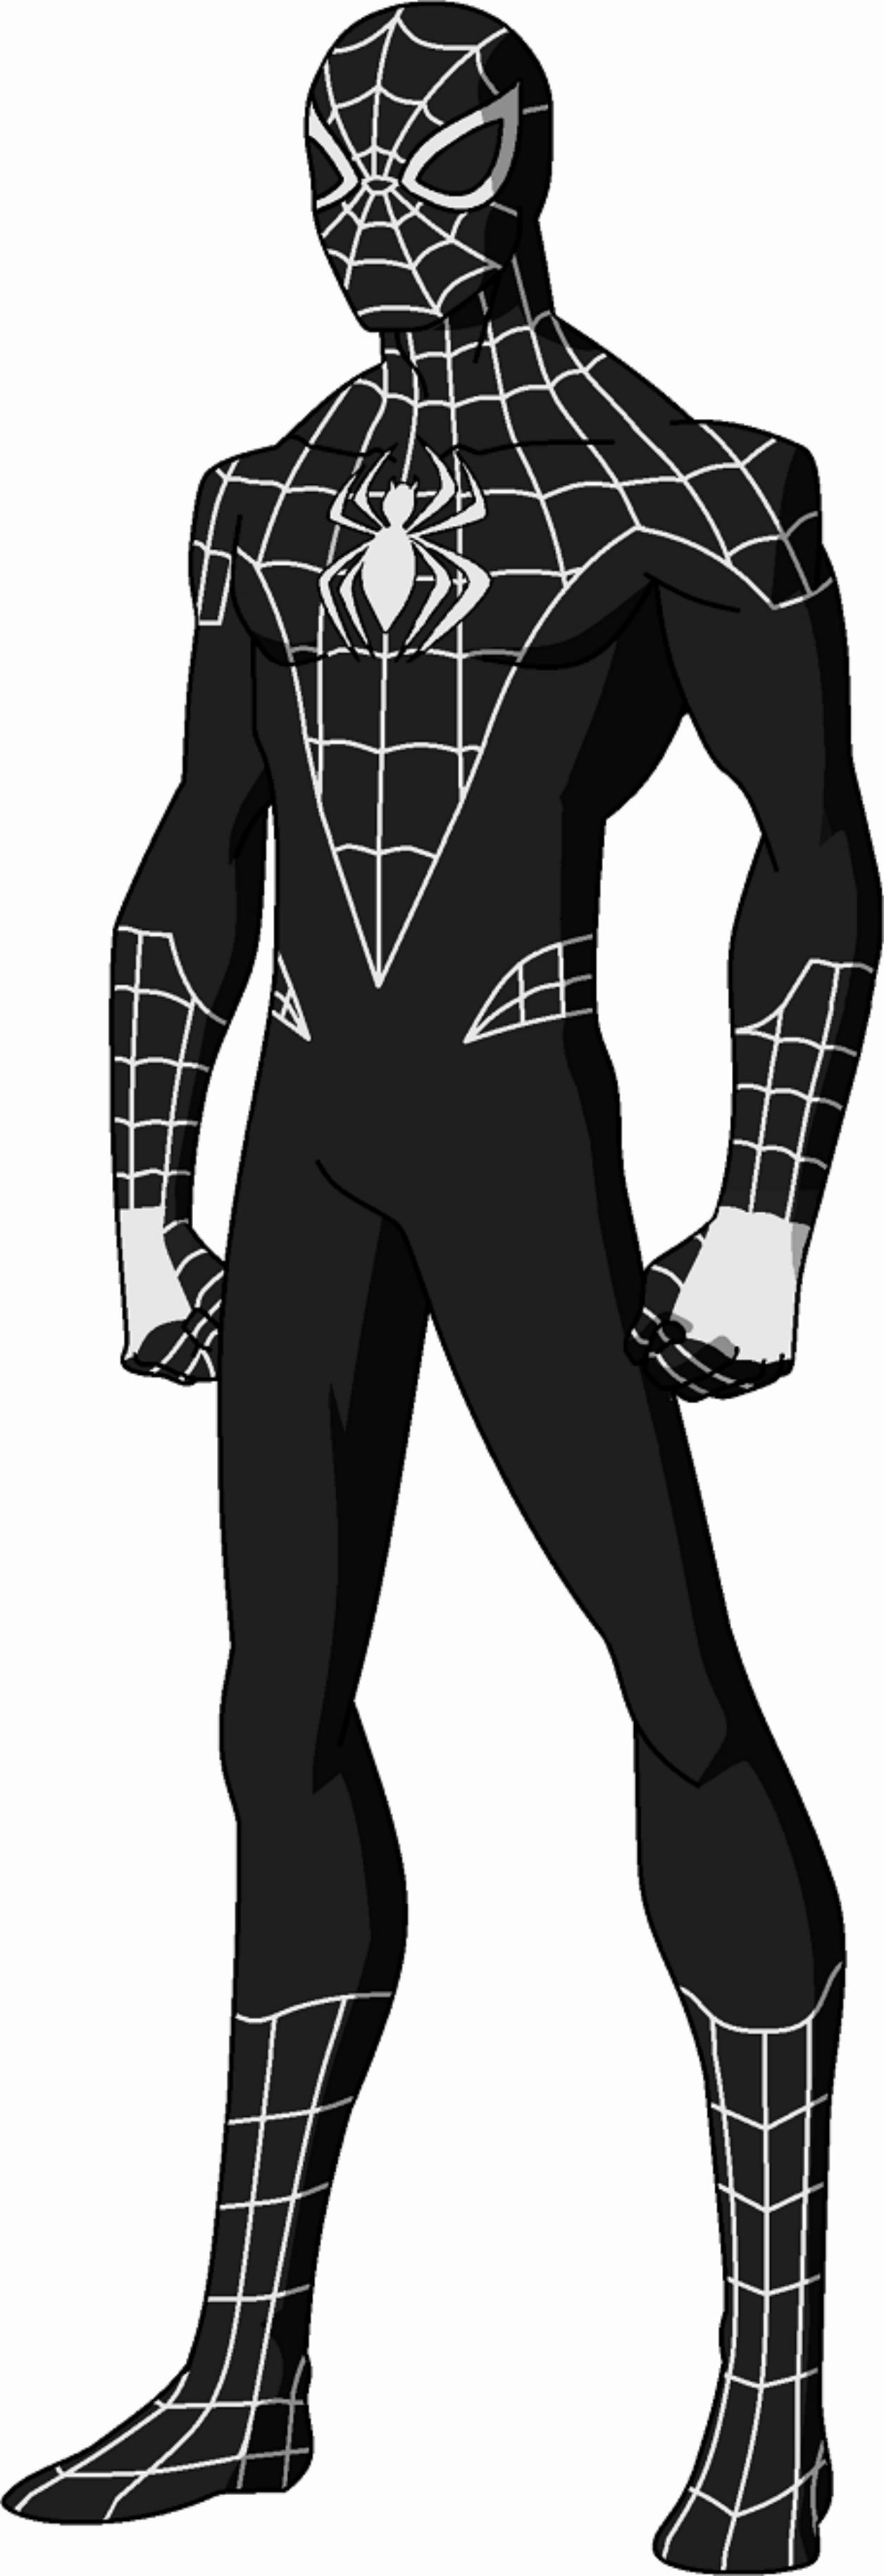 Peter Parker (Earth-416274) | Marvel Fanfiction Wiki | FANDOM